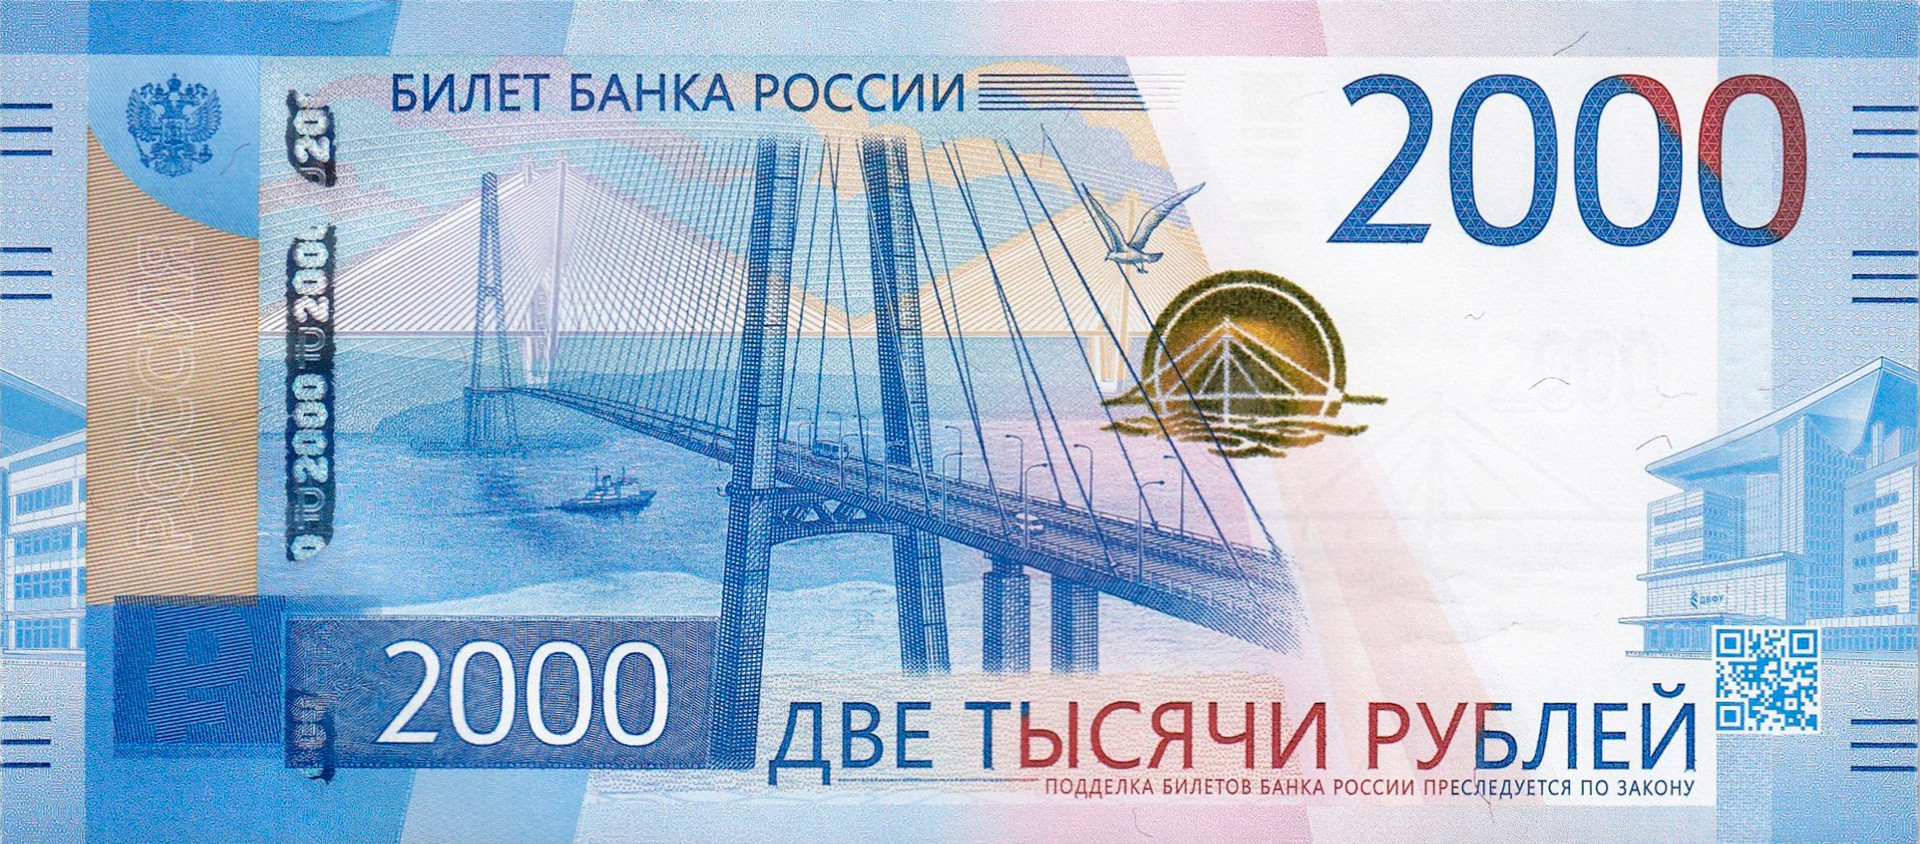 A nova nota de 2.000 rublos